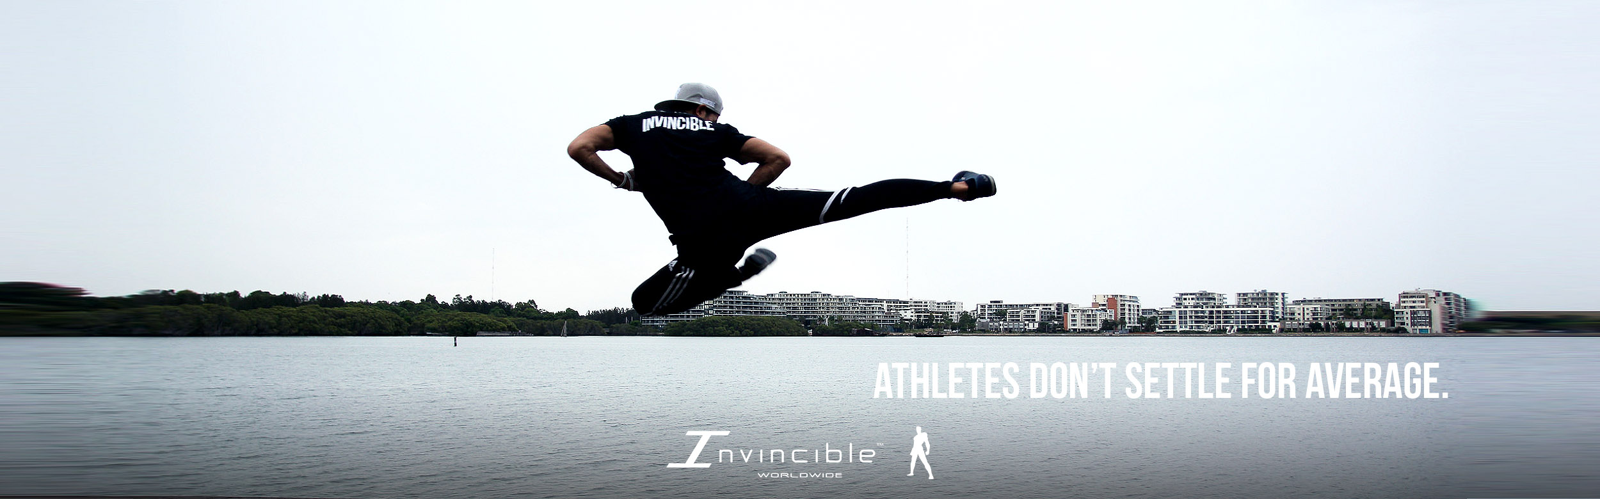 Athletes Don